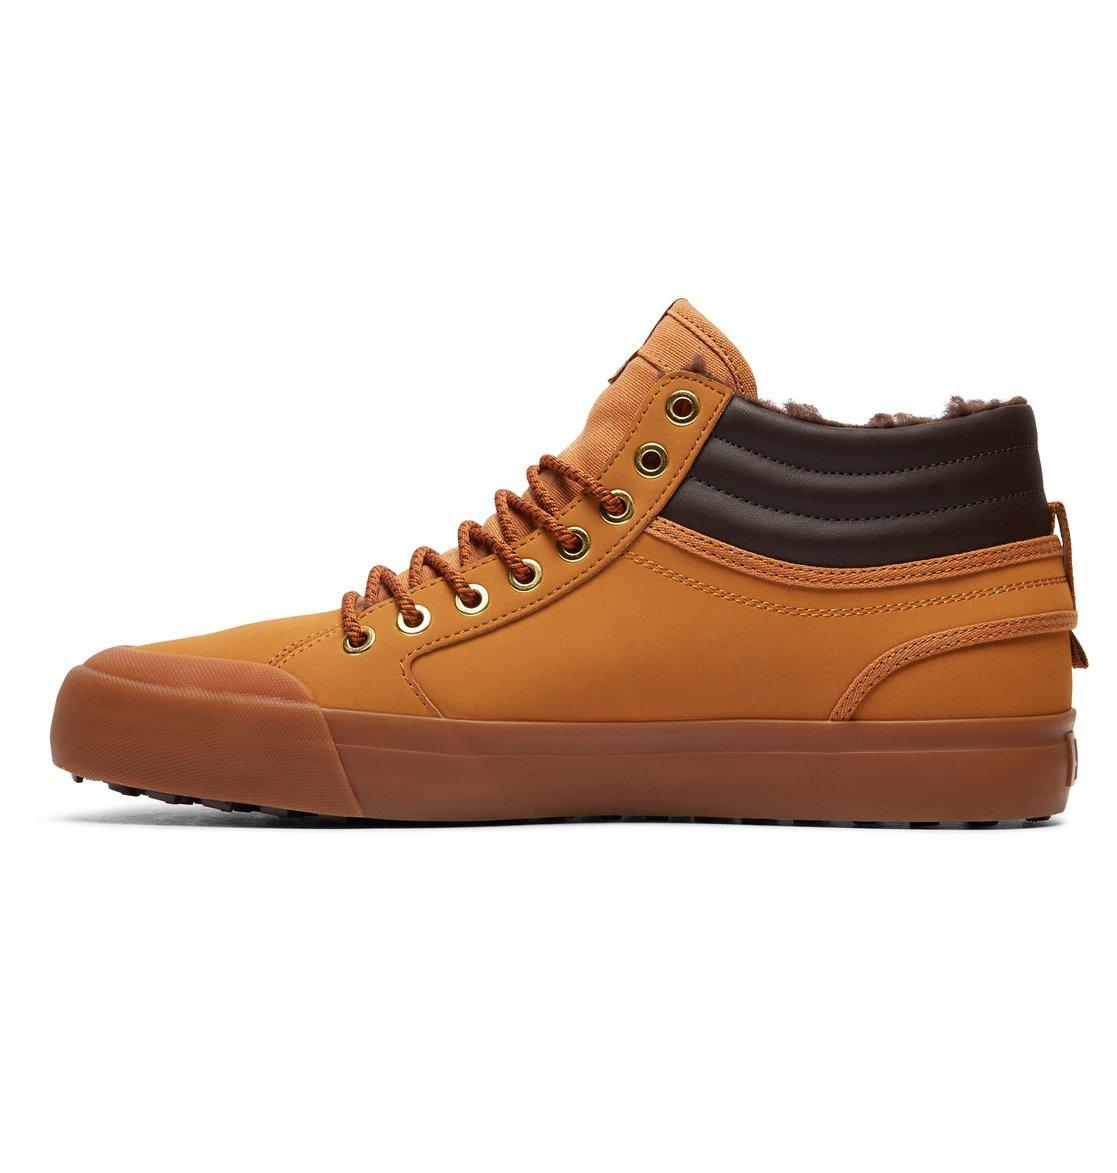 SELECTED Sel Latin New NOOS ID 16041224 - Zapatos de cuero para hombre, color negro, talla 44 EU (10 Herren UK)